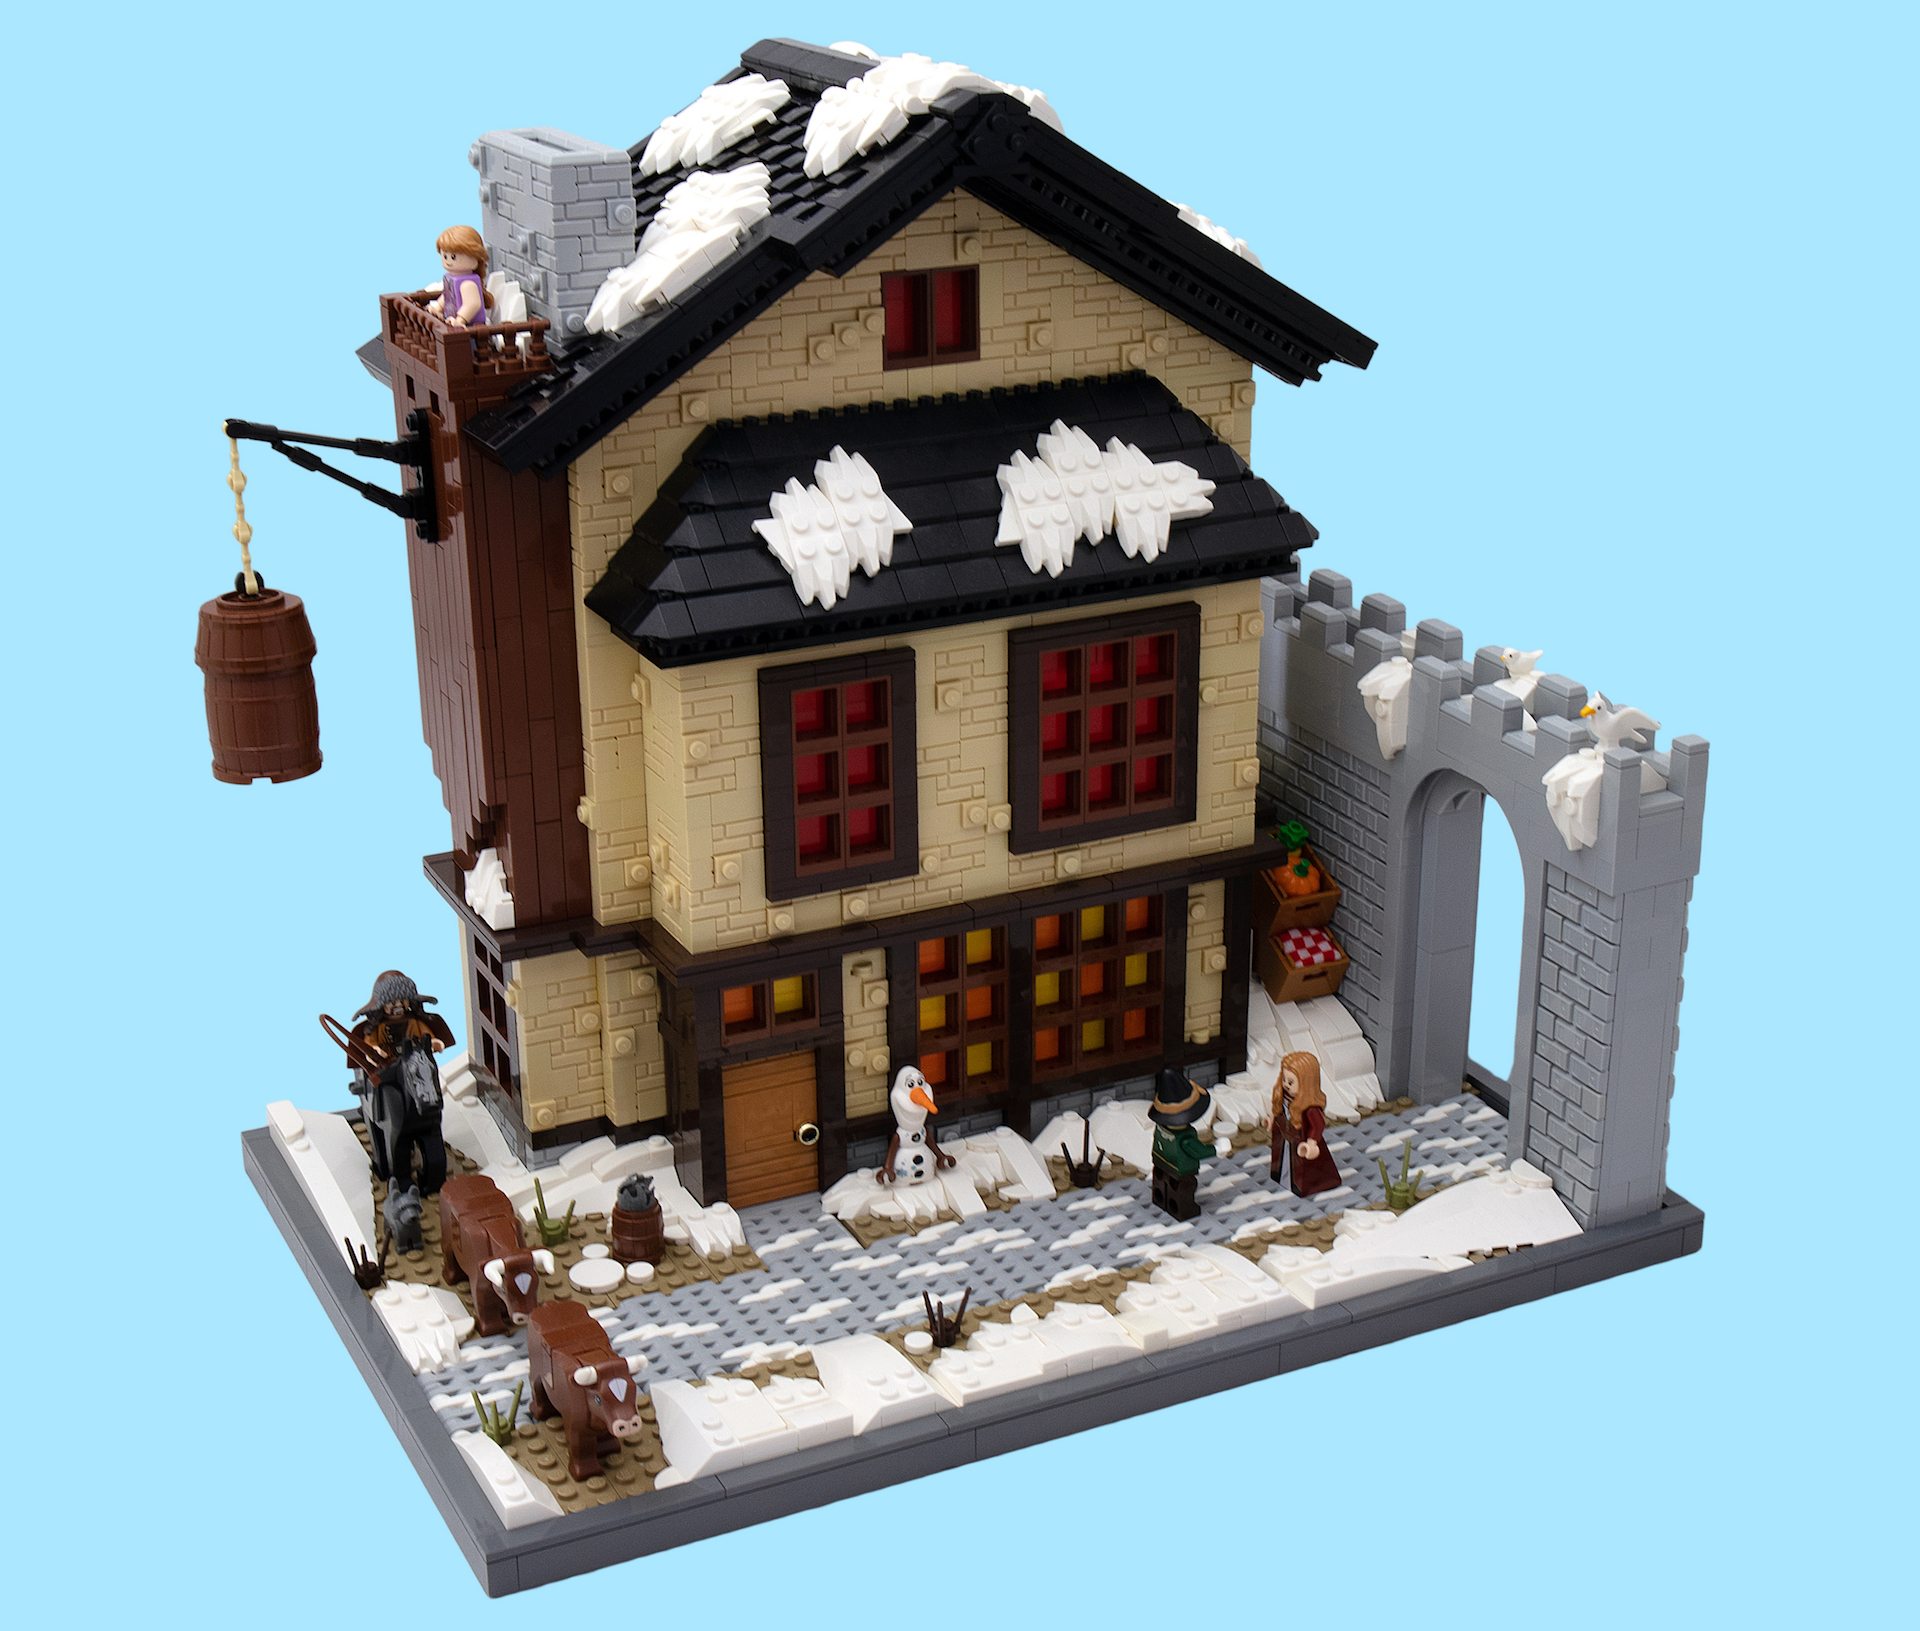 Concurs Winter Brickland – Creatia 3: Alehouse